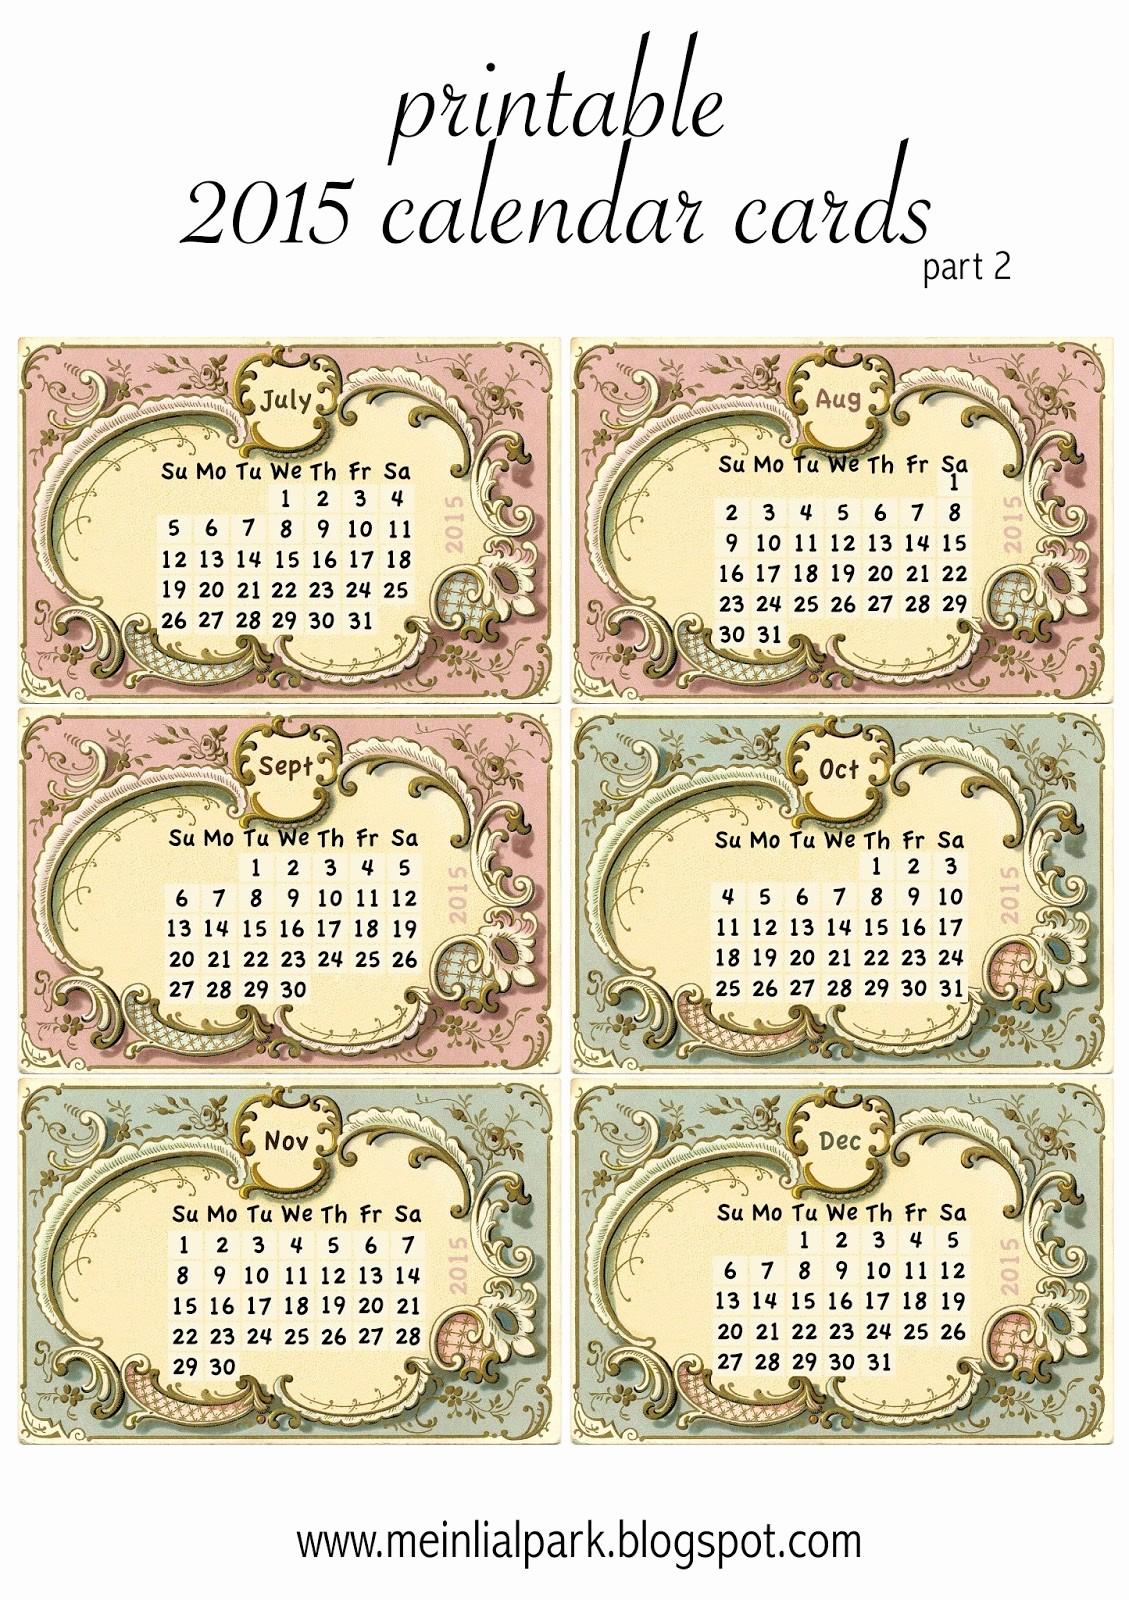 Printable 3 Month Calendar 2015 Unique Free Printable 2015 Calendar Cards Part 2